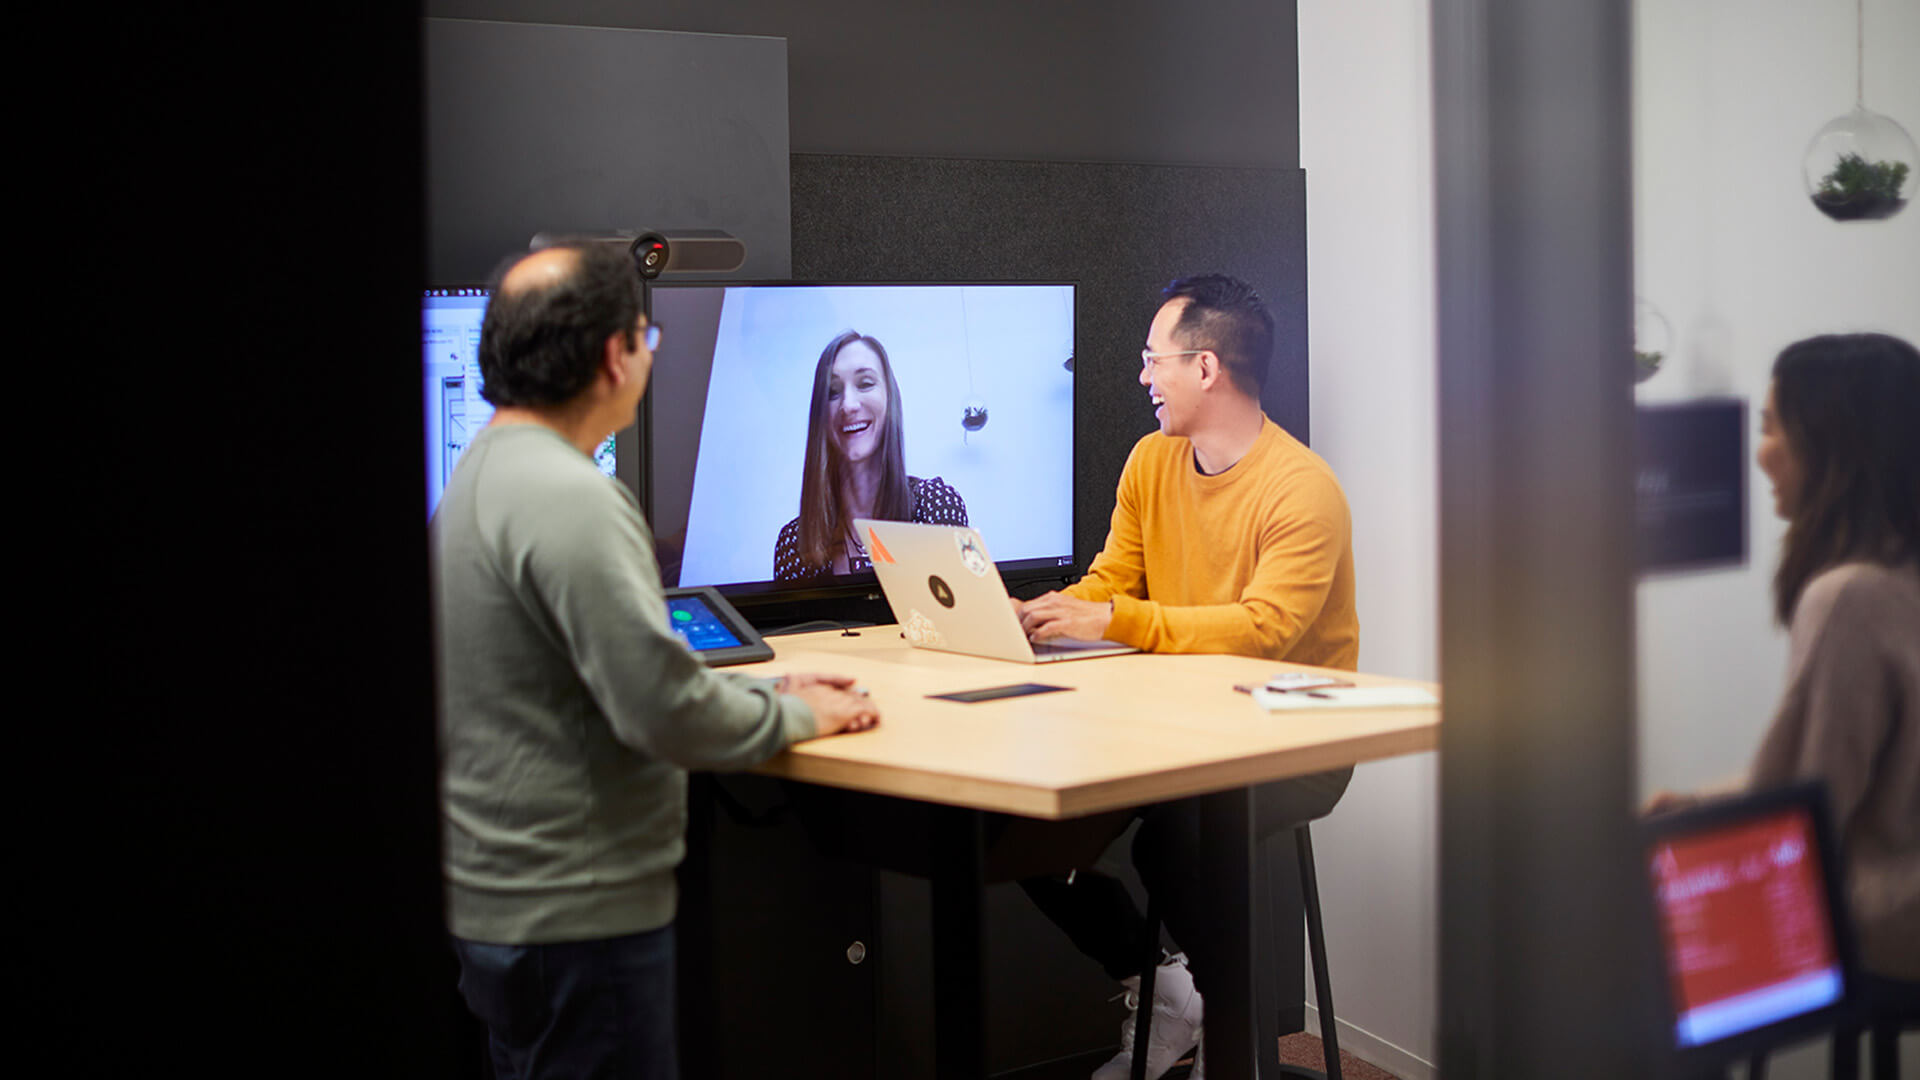 Team members video chatting